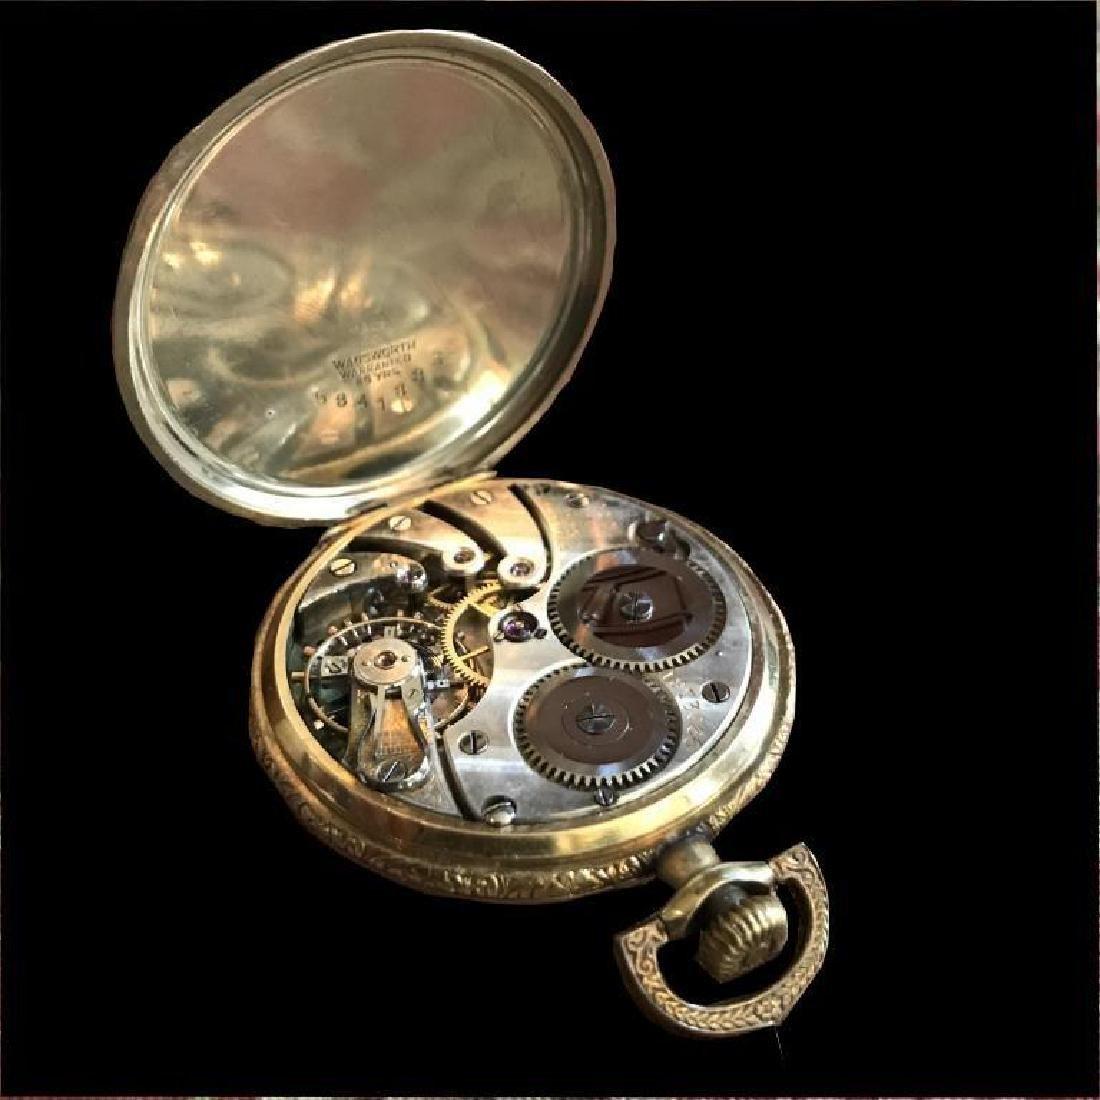 1905 Longines 17 Jewels Gold Filled Pocket Watch - 6